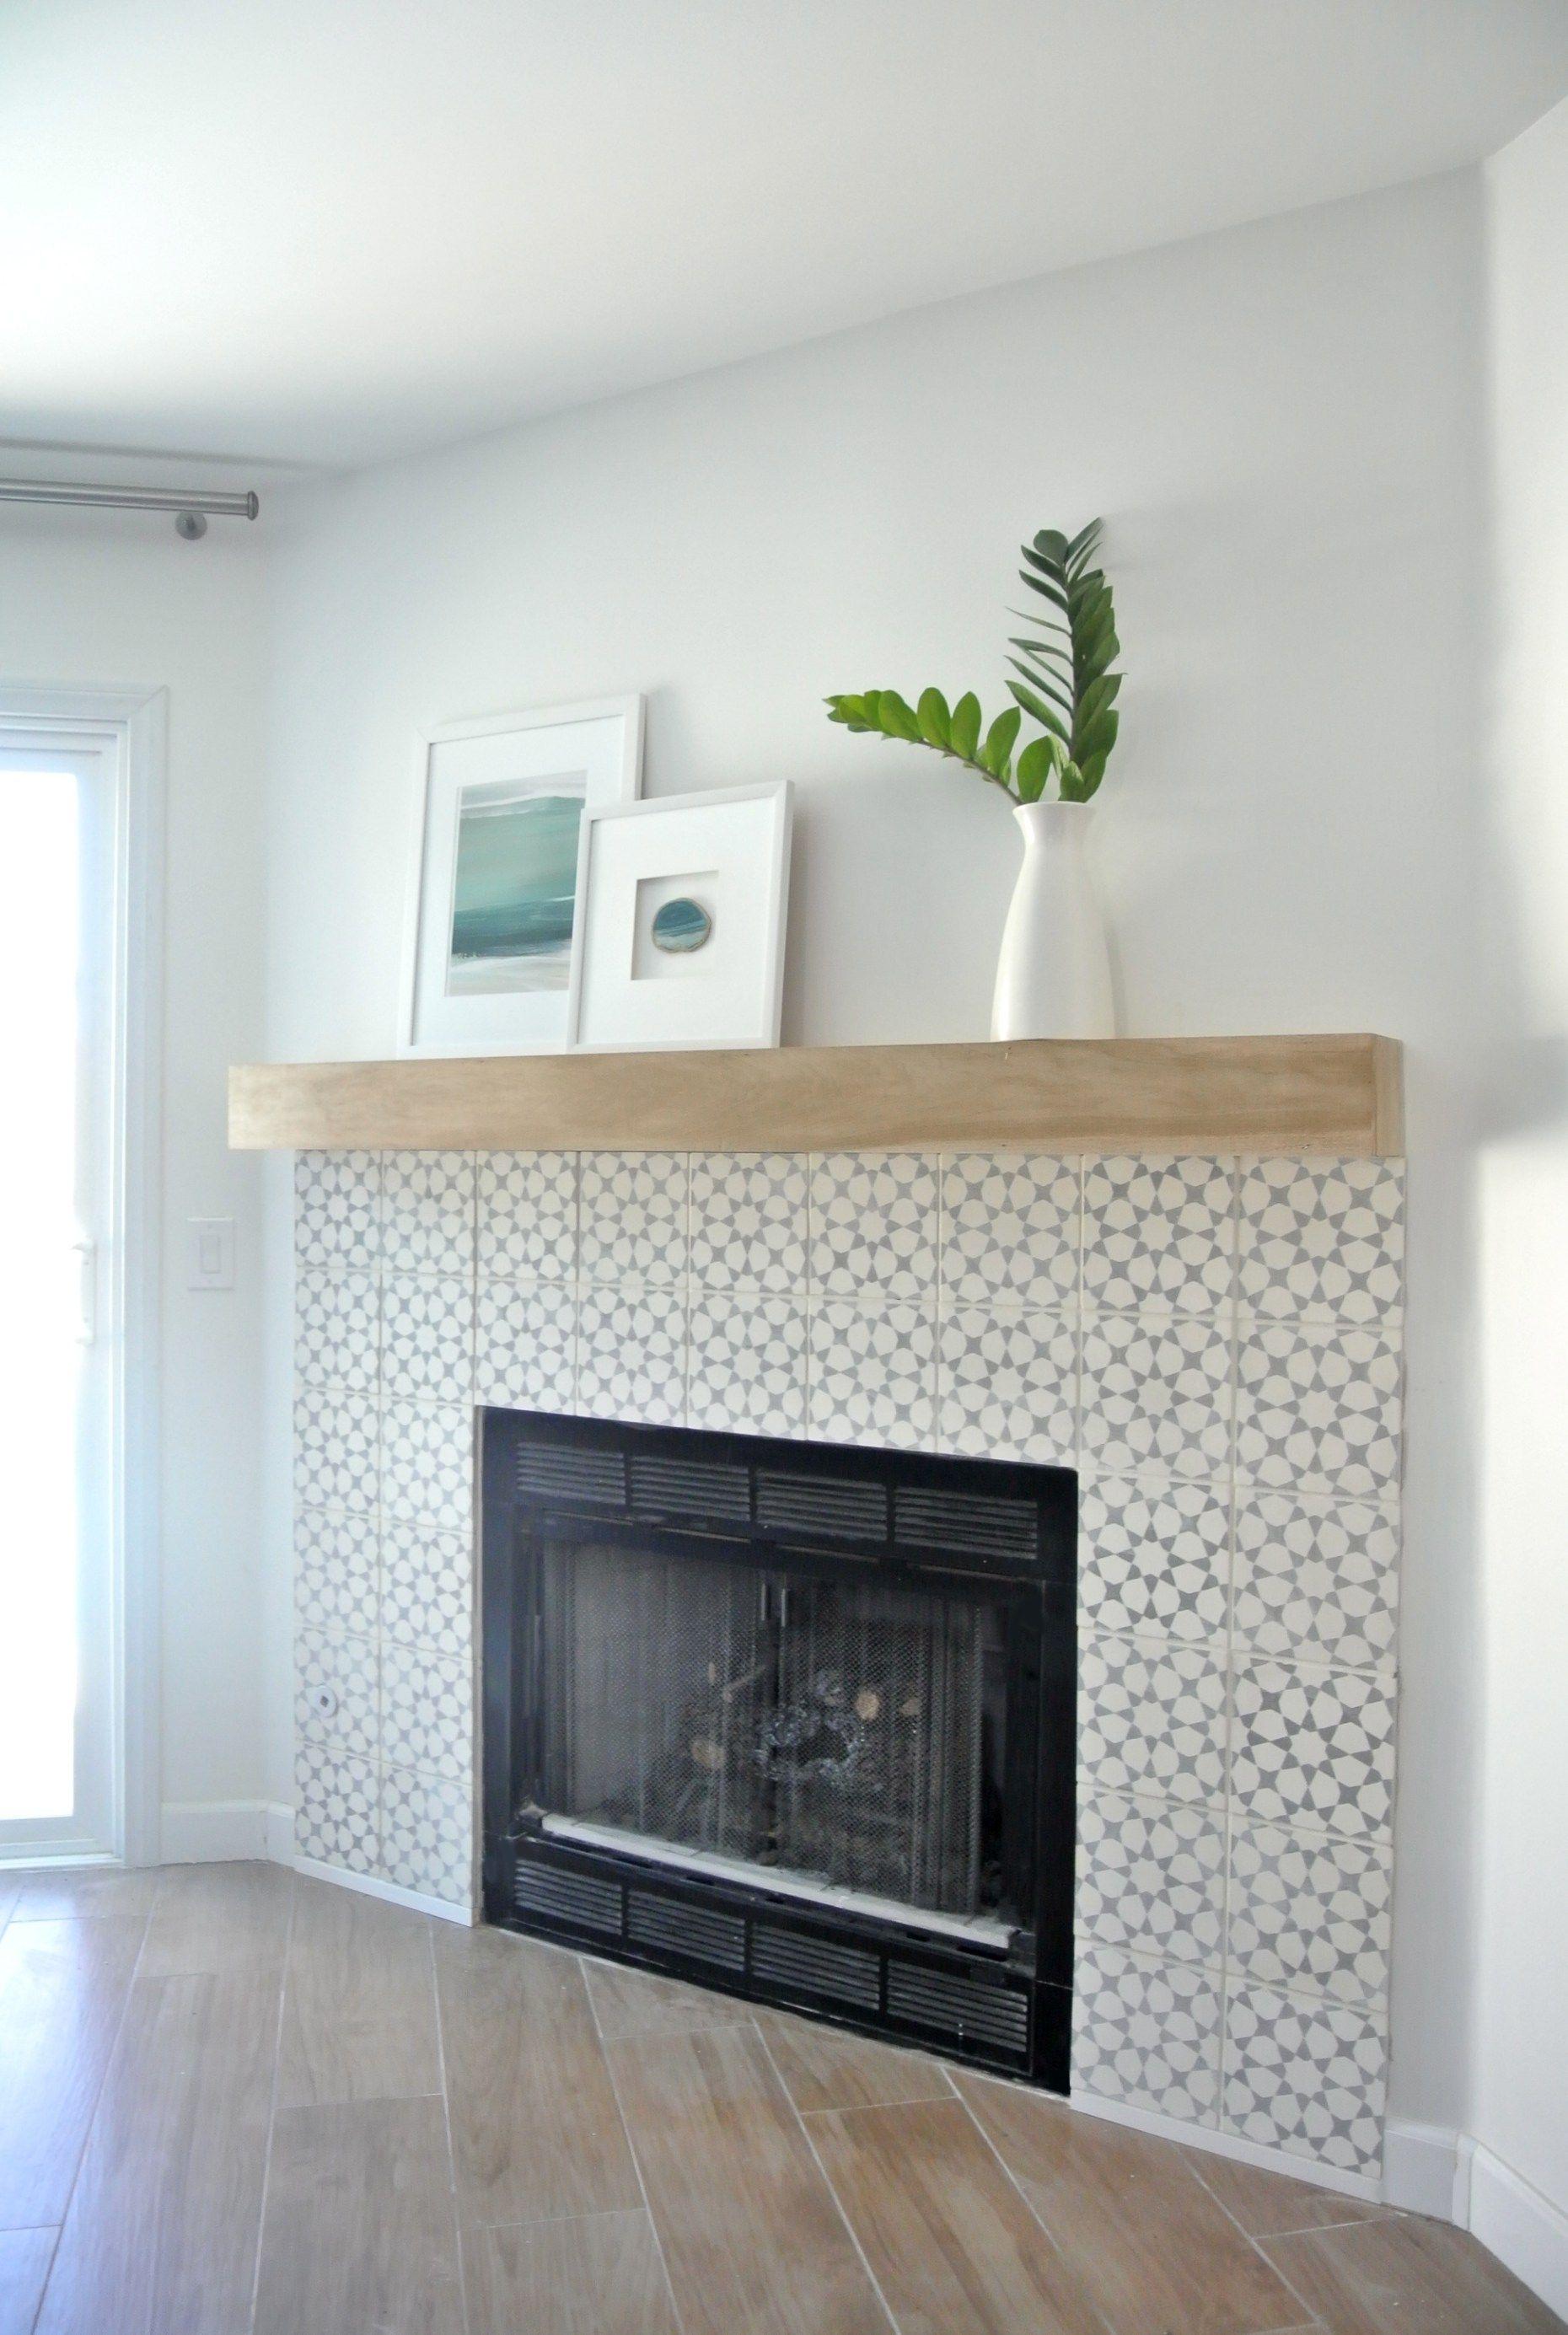 DIY Fireplace Makeover Diy fireplace makeover, Fireplace